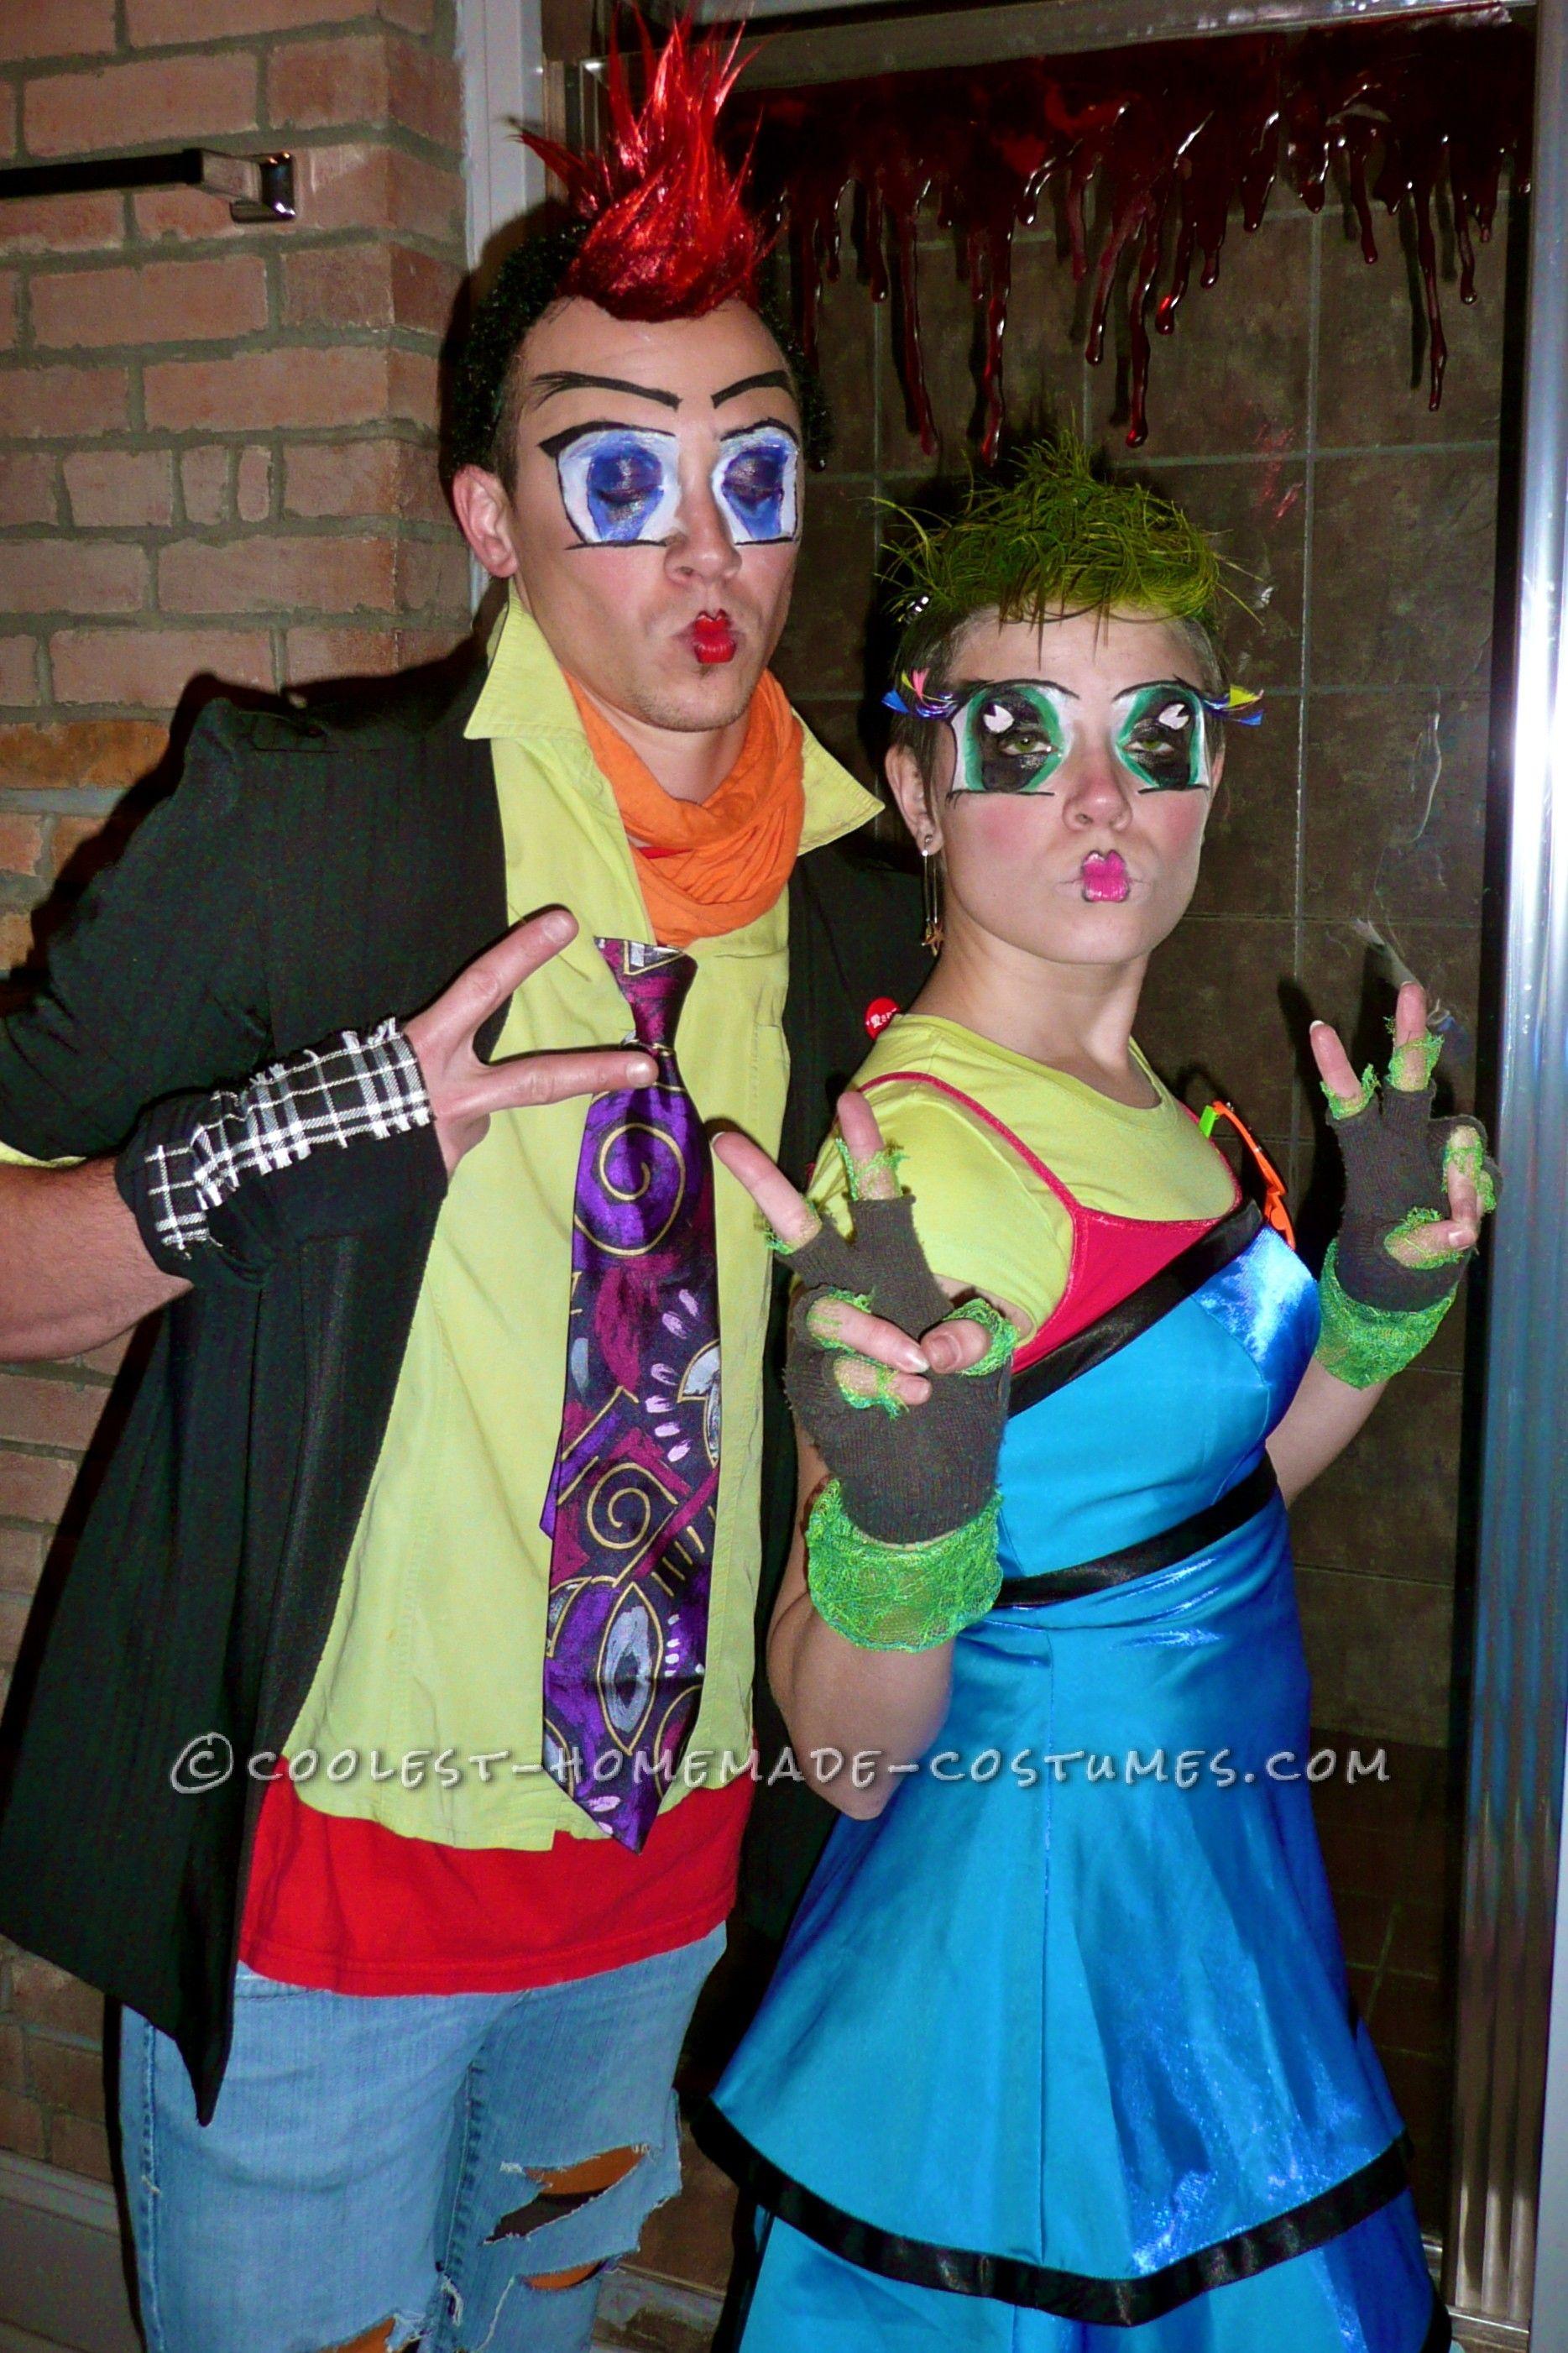 anime/harajuku street style couples costume | couples halloween